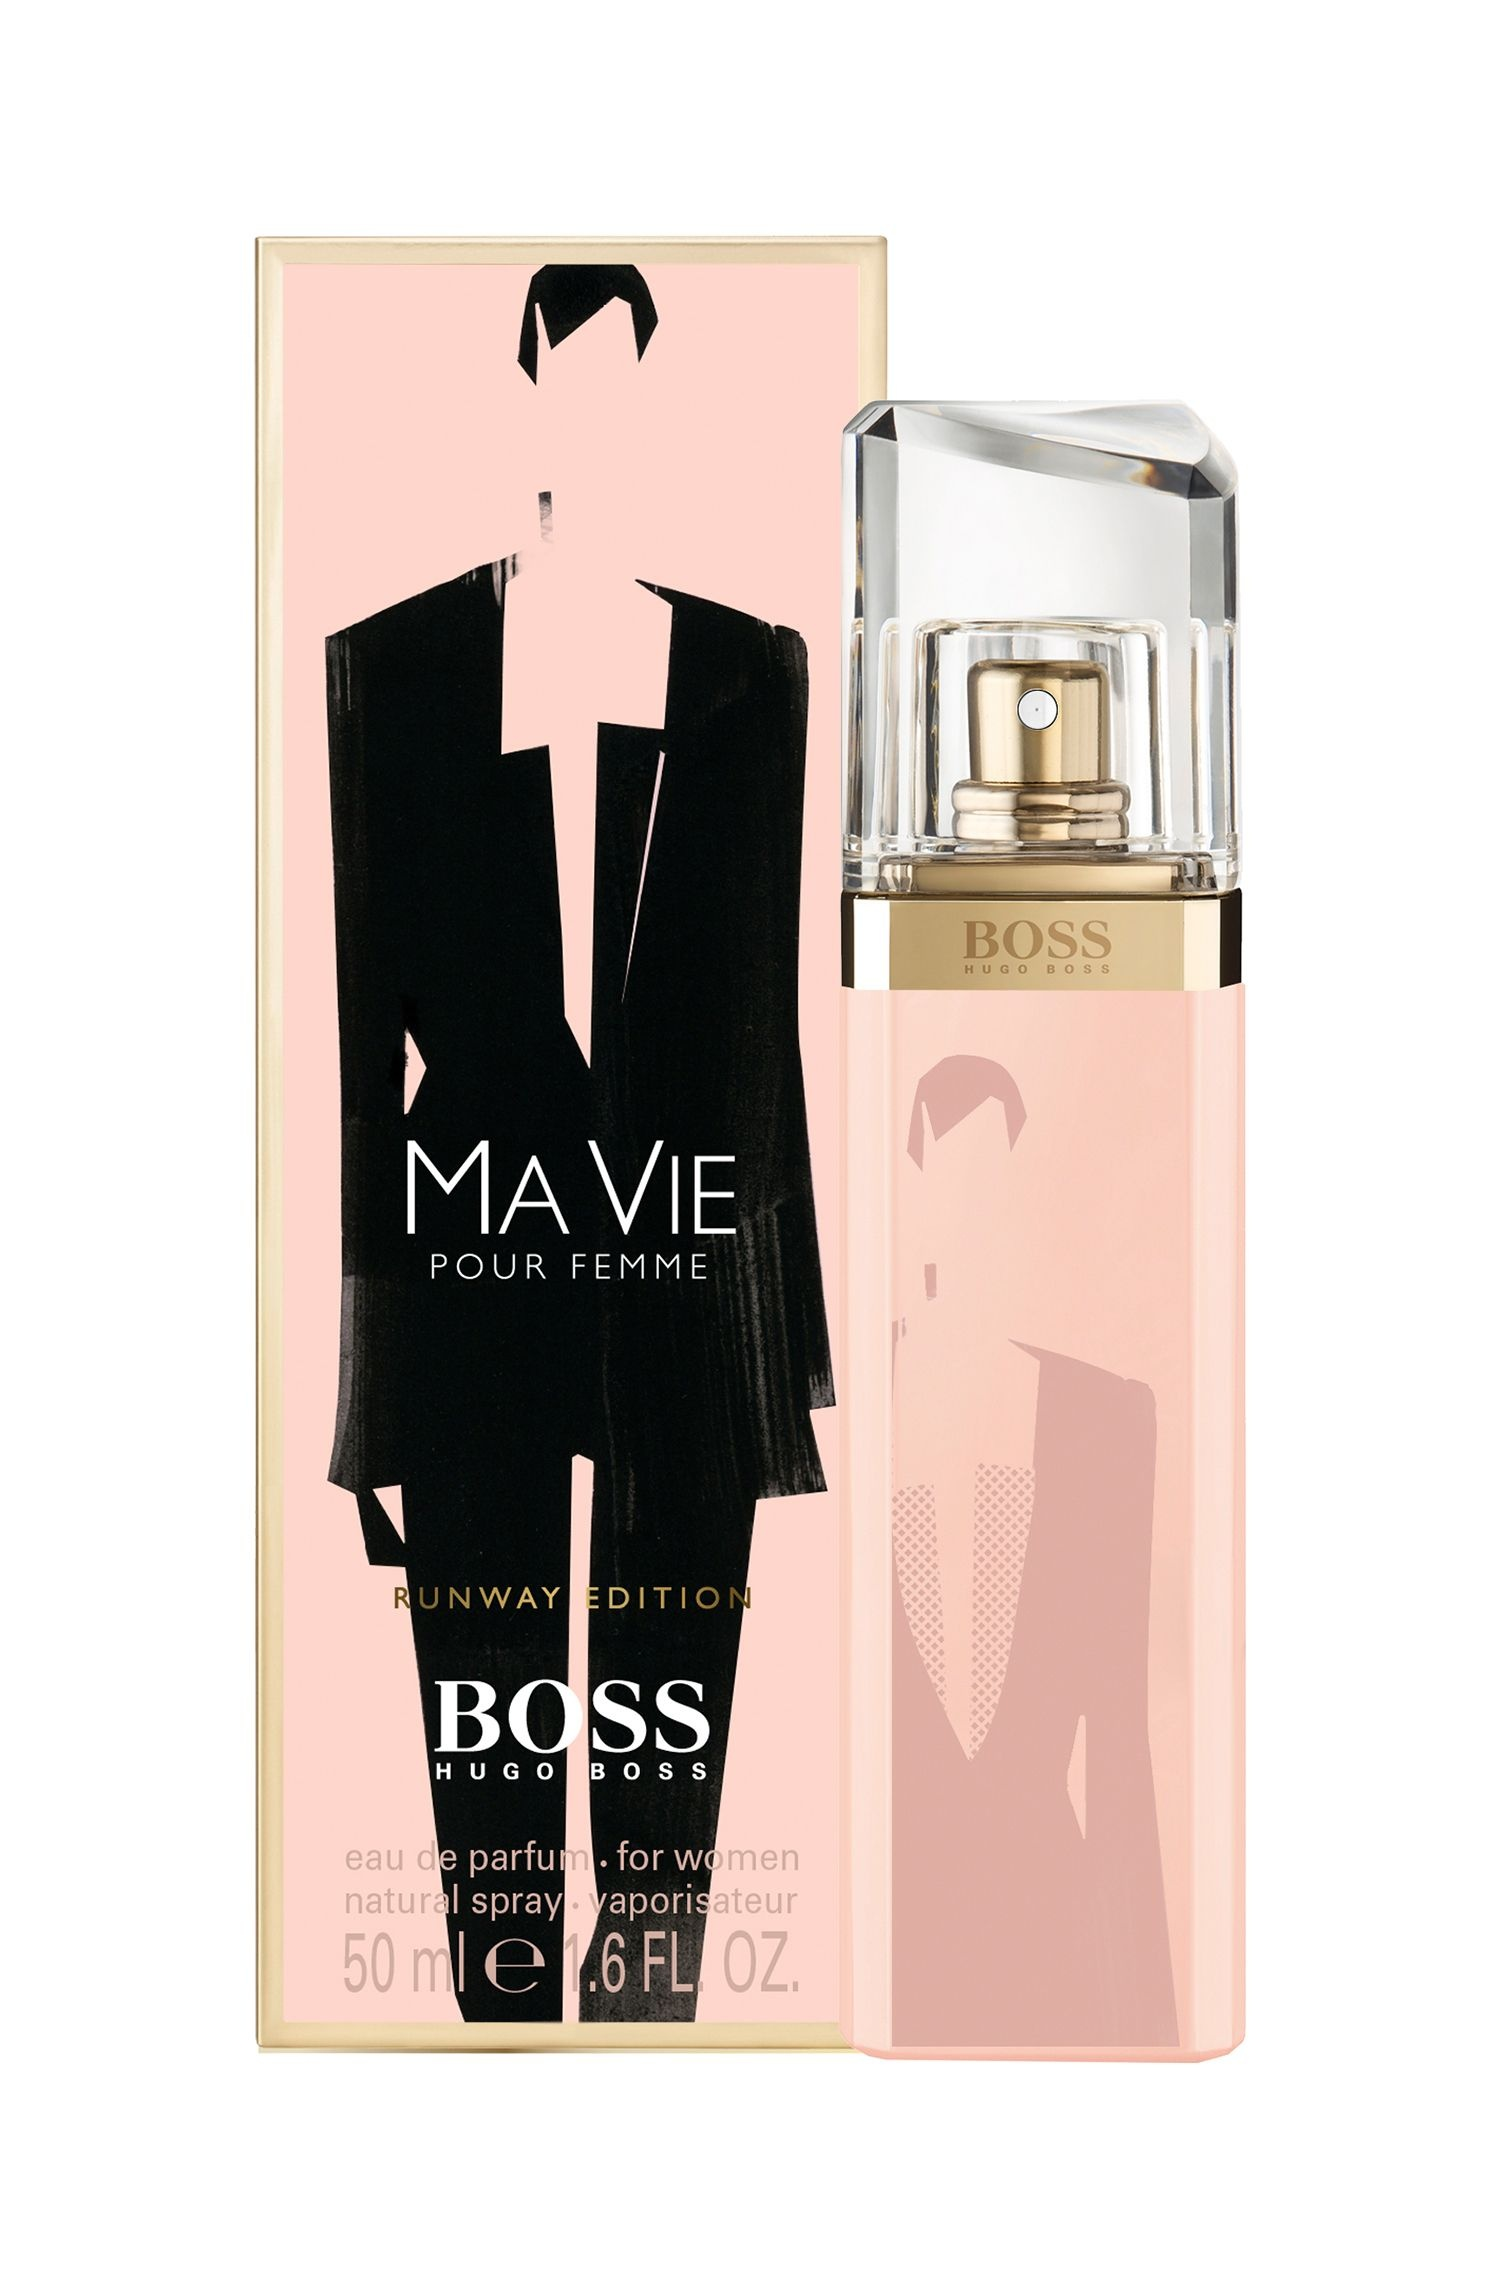 Hugo Boss Ma Vie Runway Edition Parfémovaná voda pro ženy